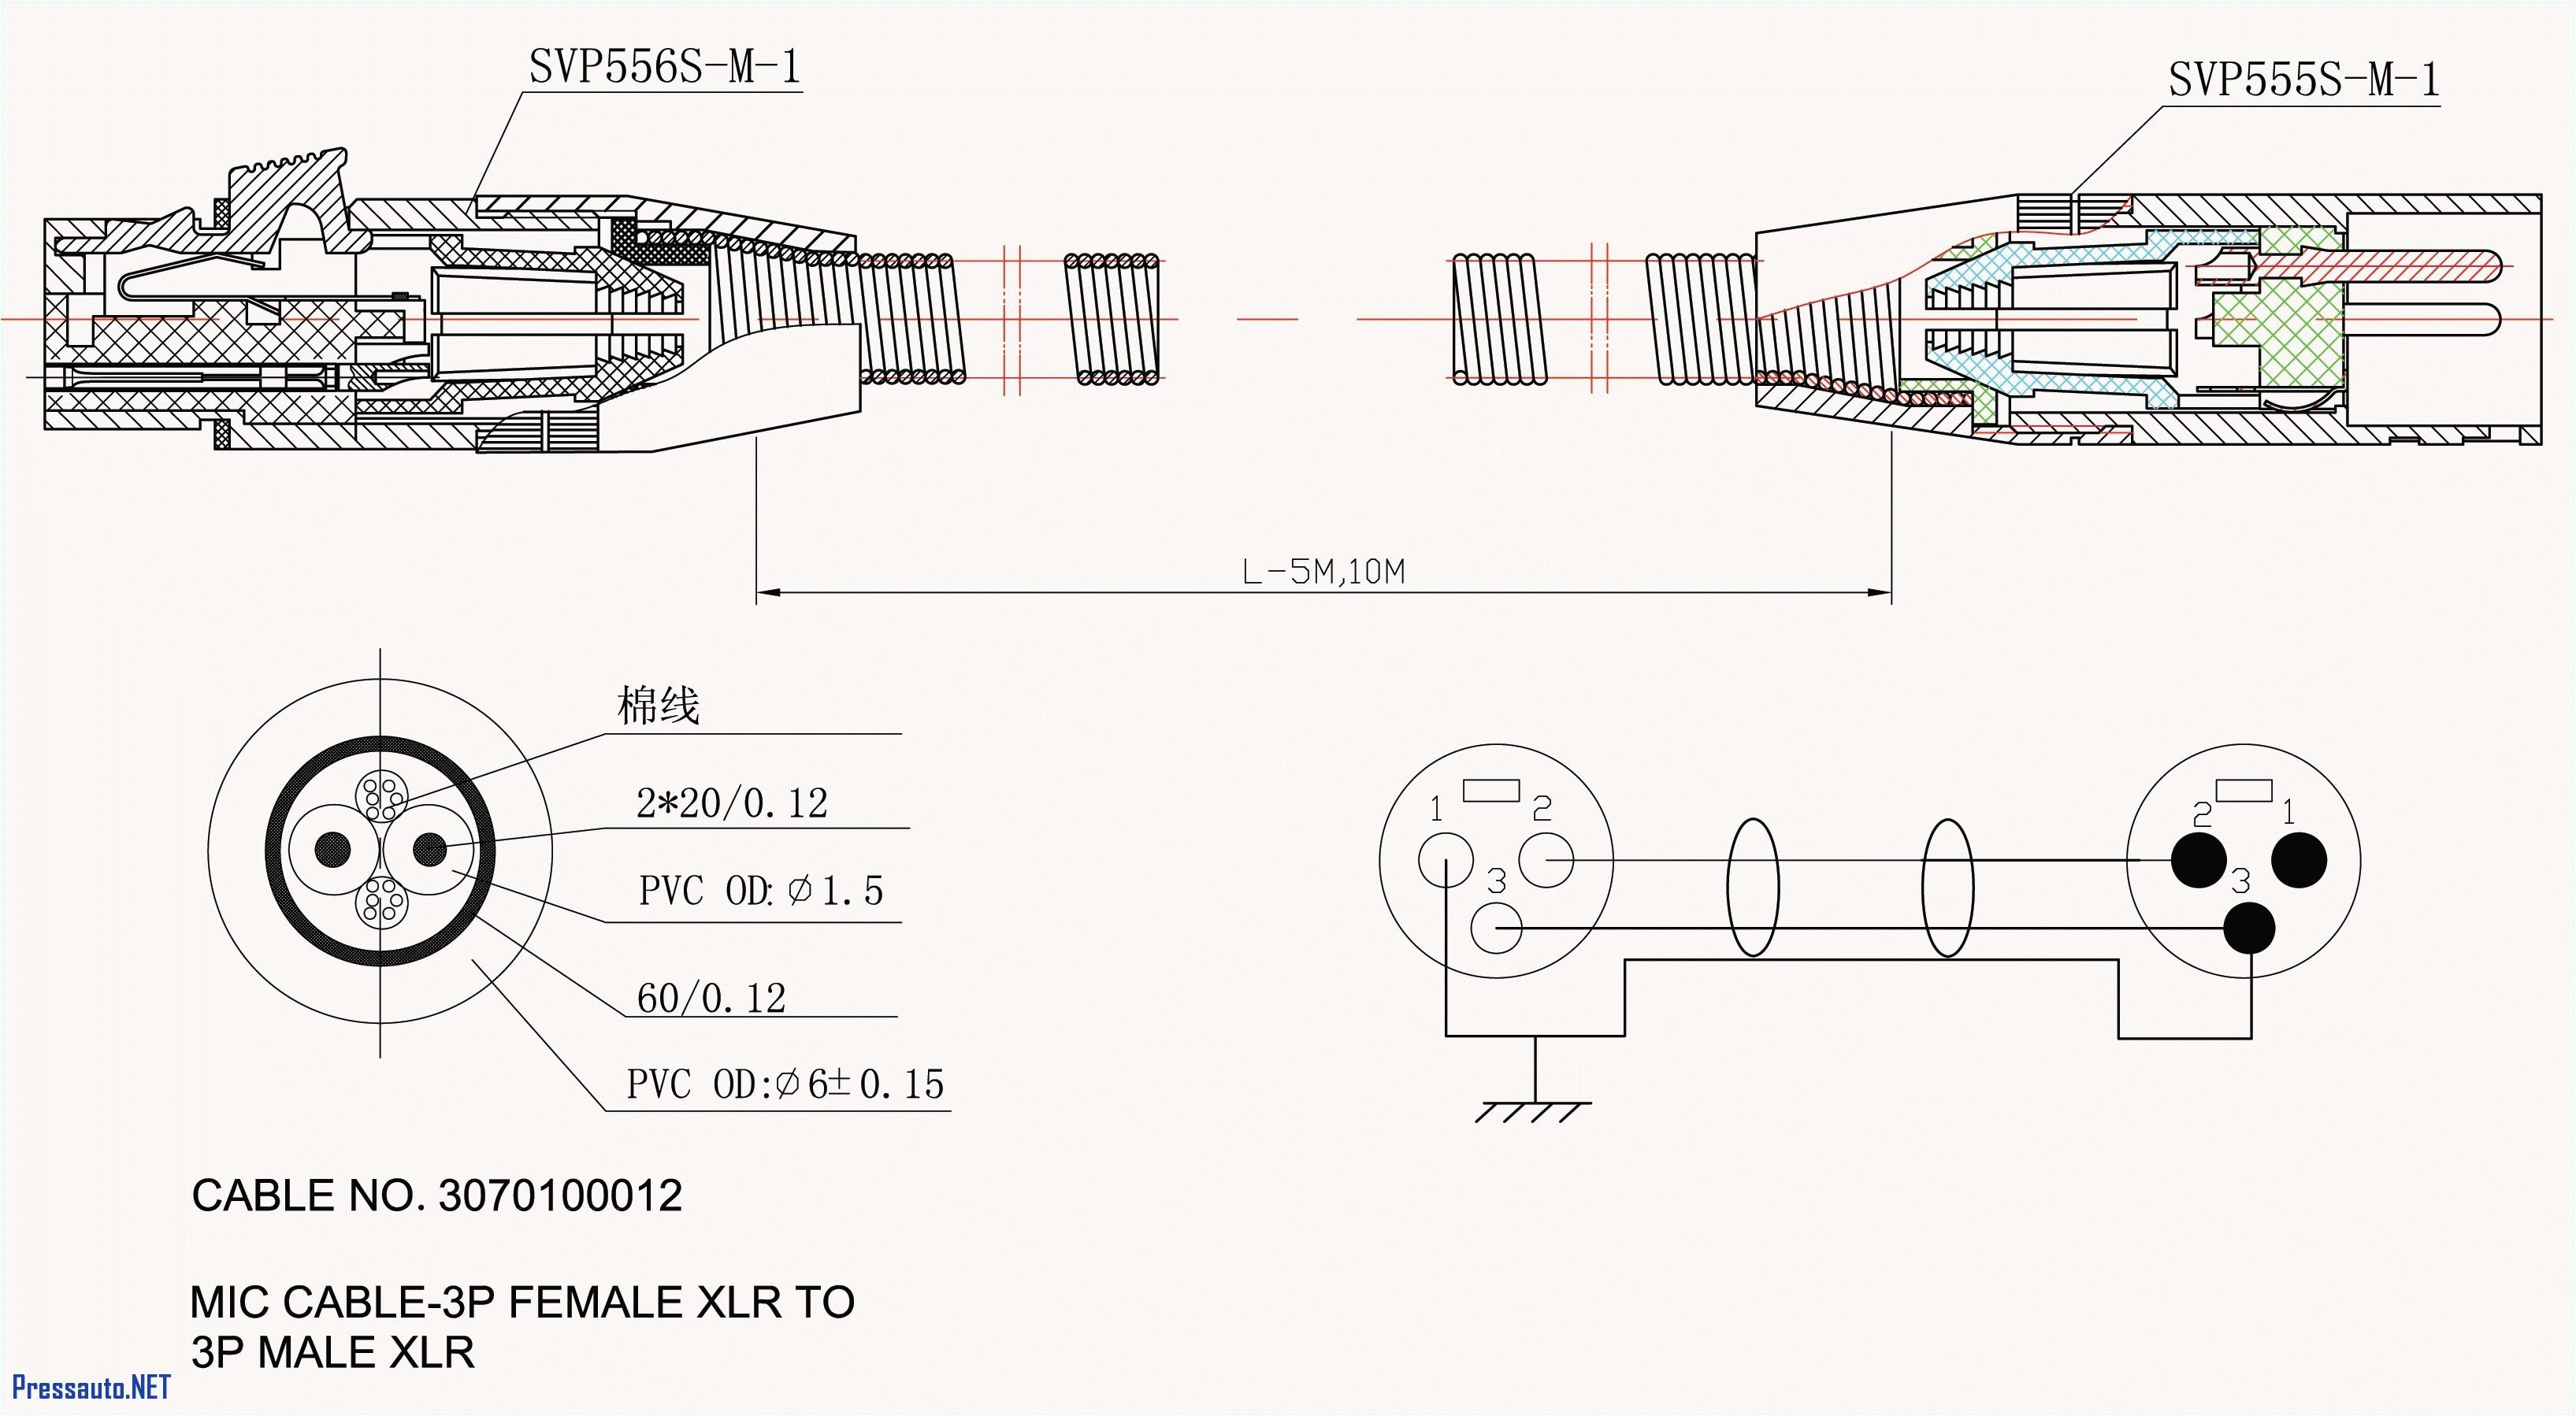 Diy Home Electrical Wiring Diagrams Wiring Diagram Rv Park Wiring Diagram Official